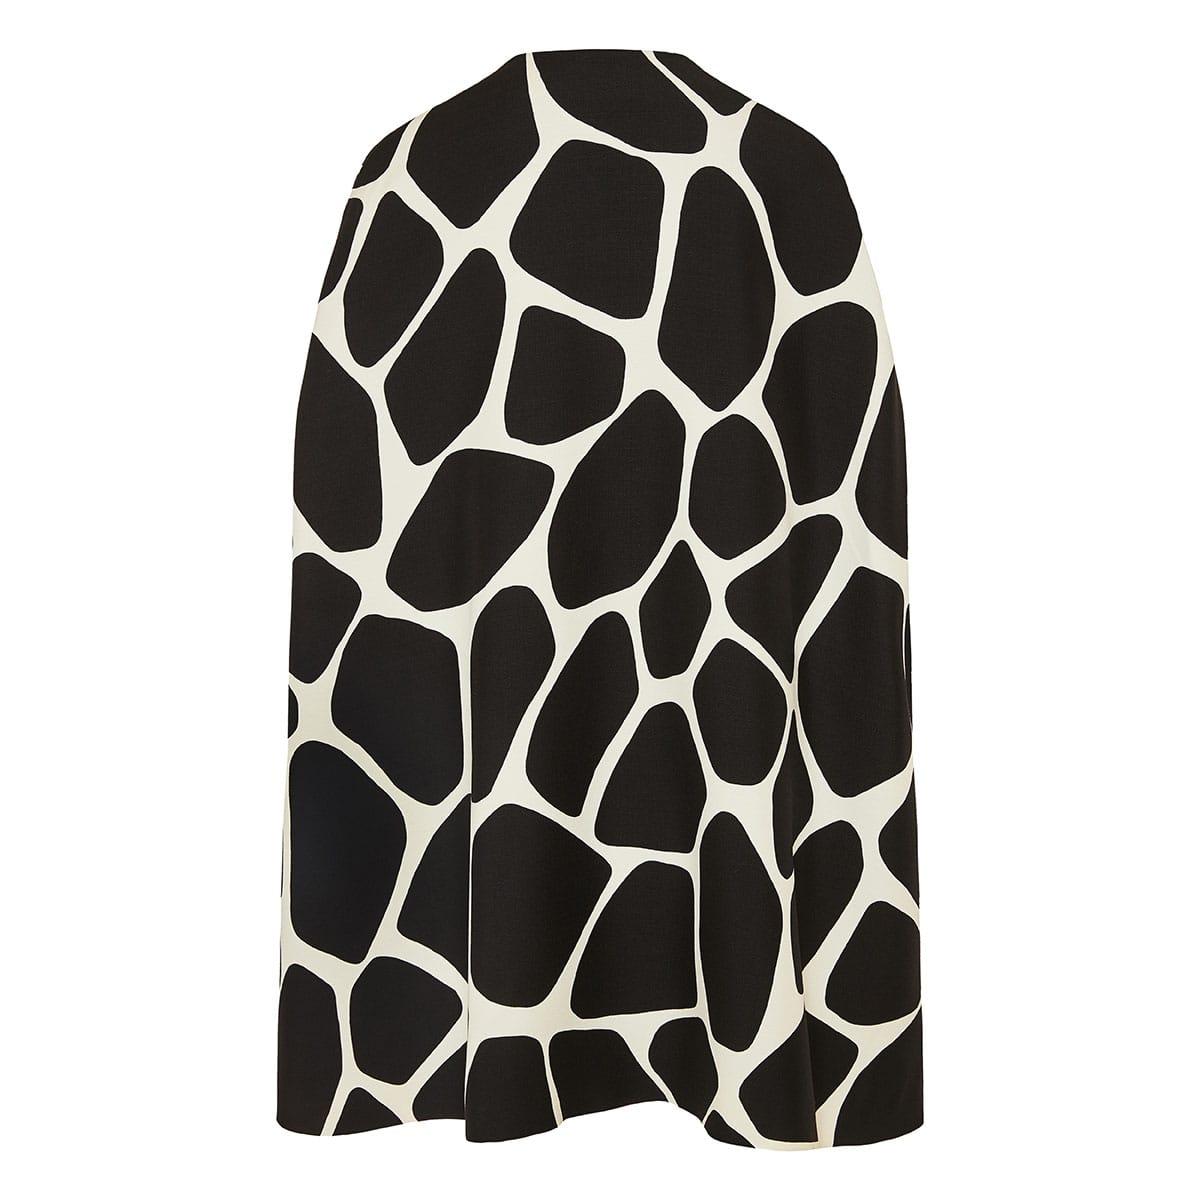 Giraffe printed cape